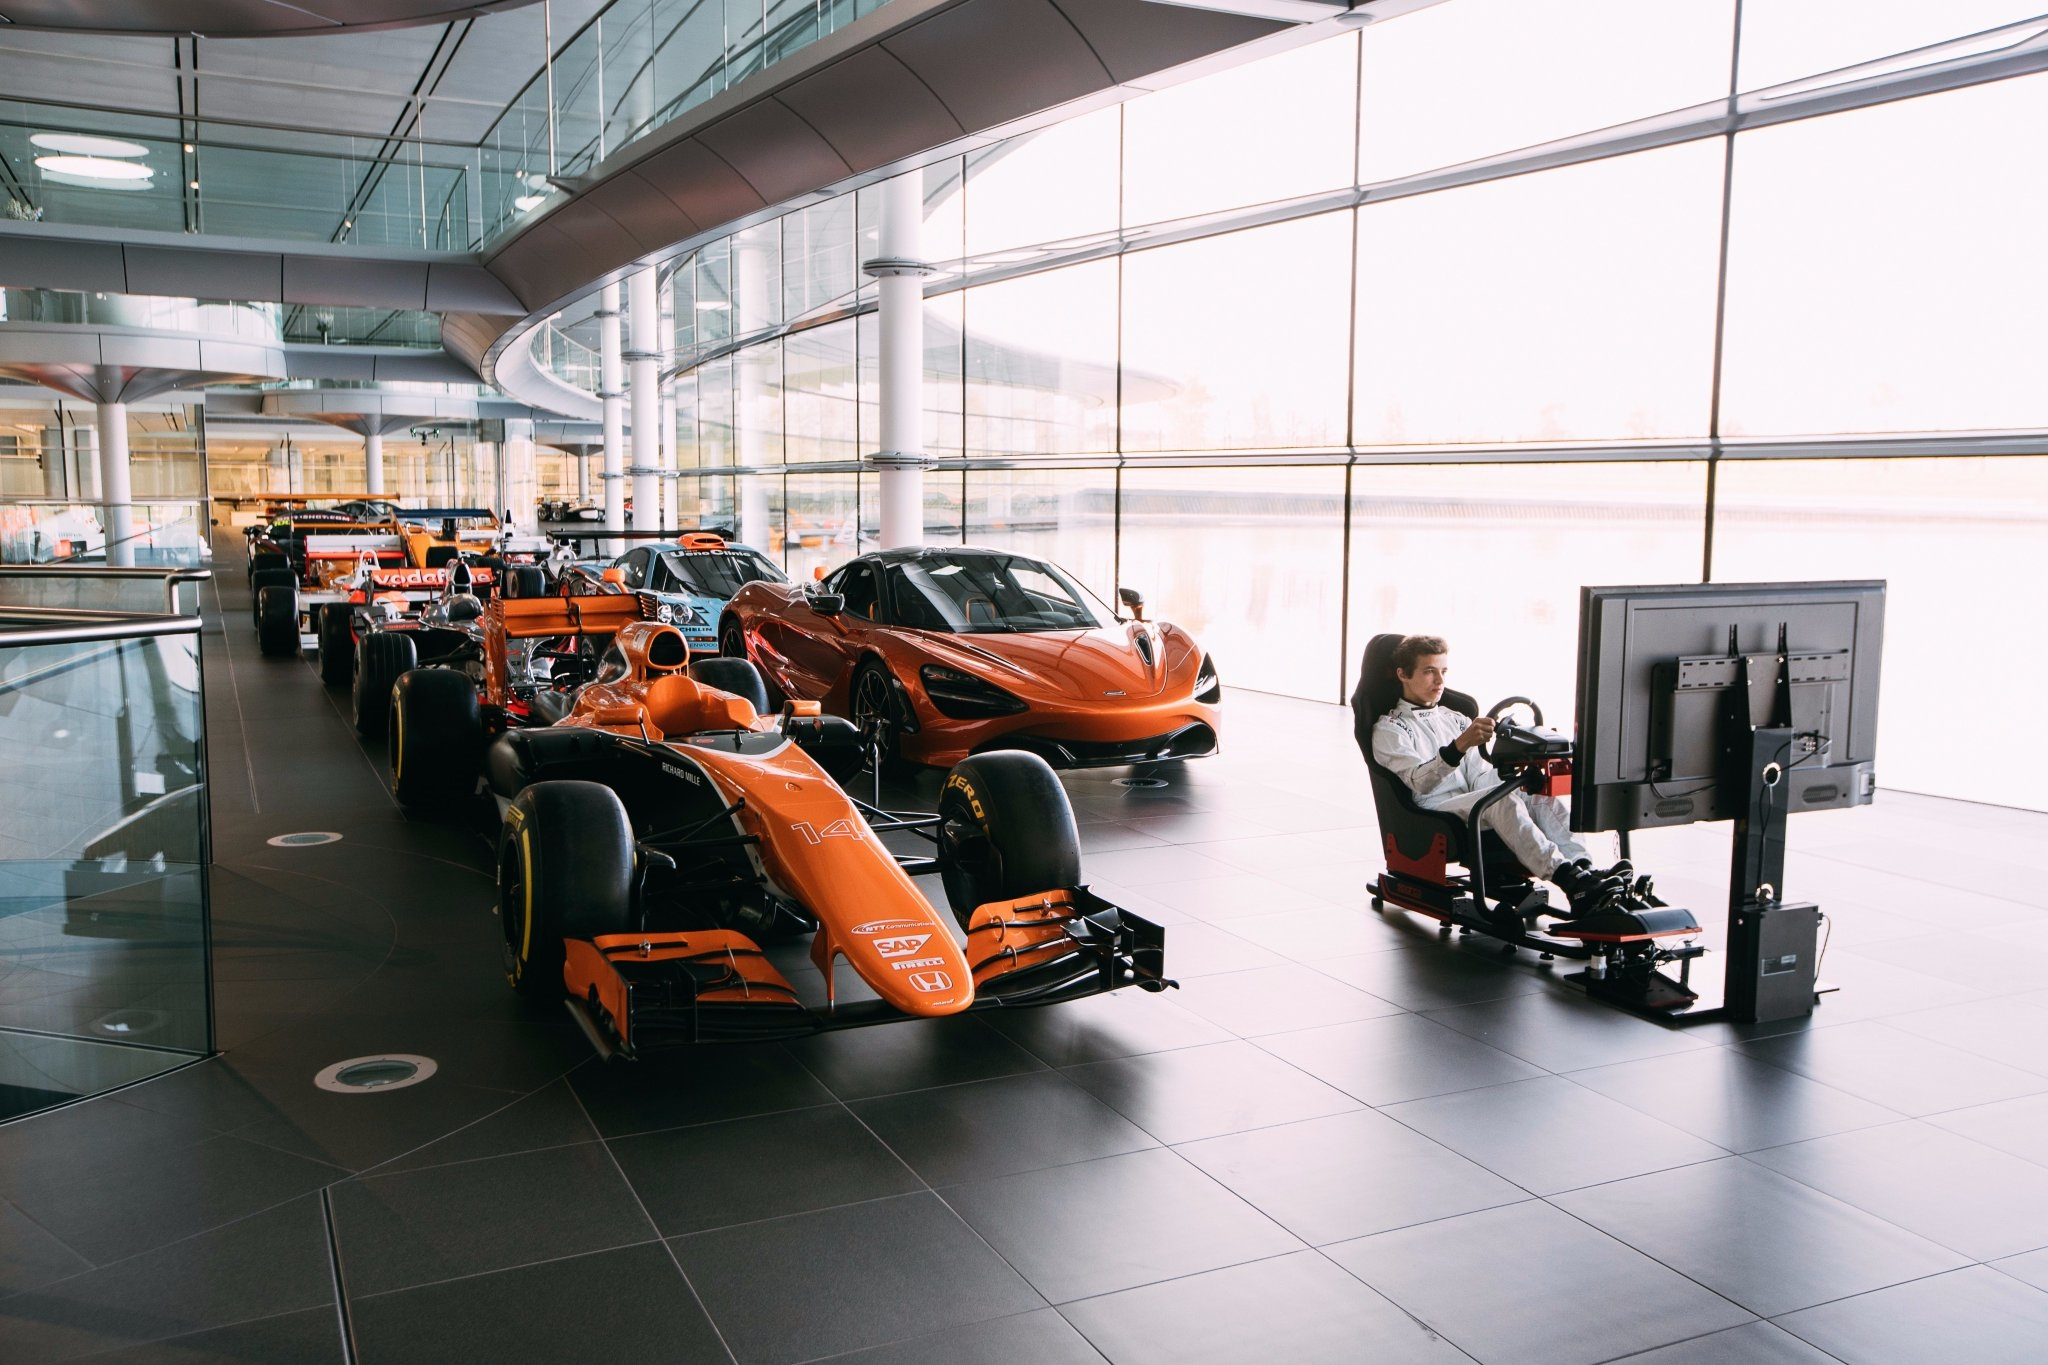 McLaren to employ 'World's Fastest Gamer' esports winner as simulator driver